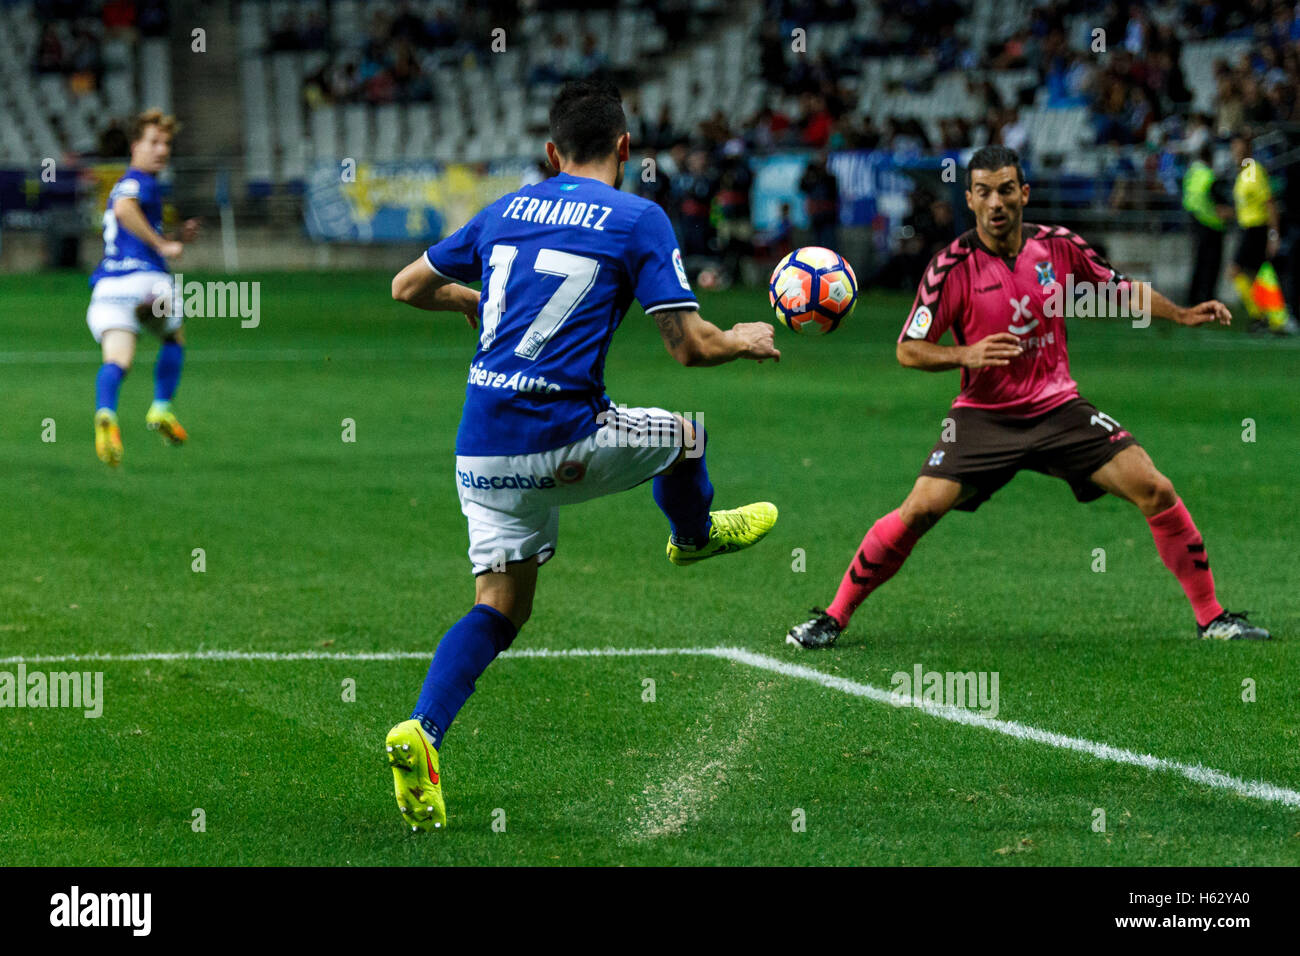 Oviedo, Asturias, Spain. 23rd Oct, 2016. Carlos Tartiere stadium. Liga 123 match between Real Oviedo v CD Tenerife. - Stock Image